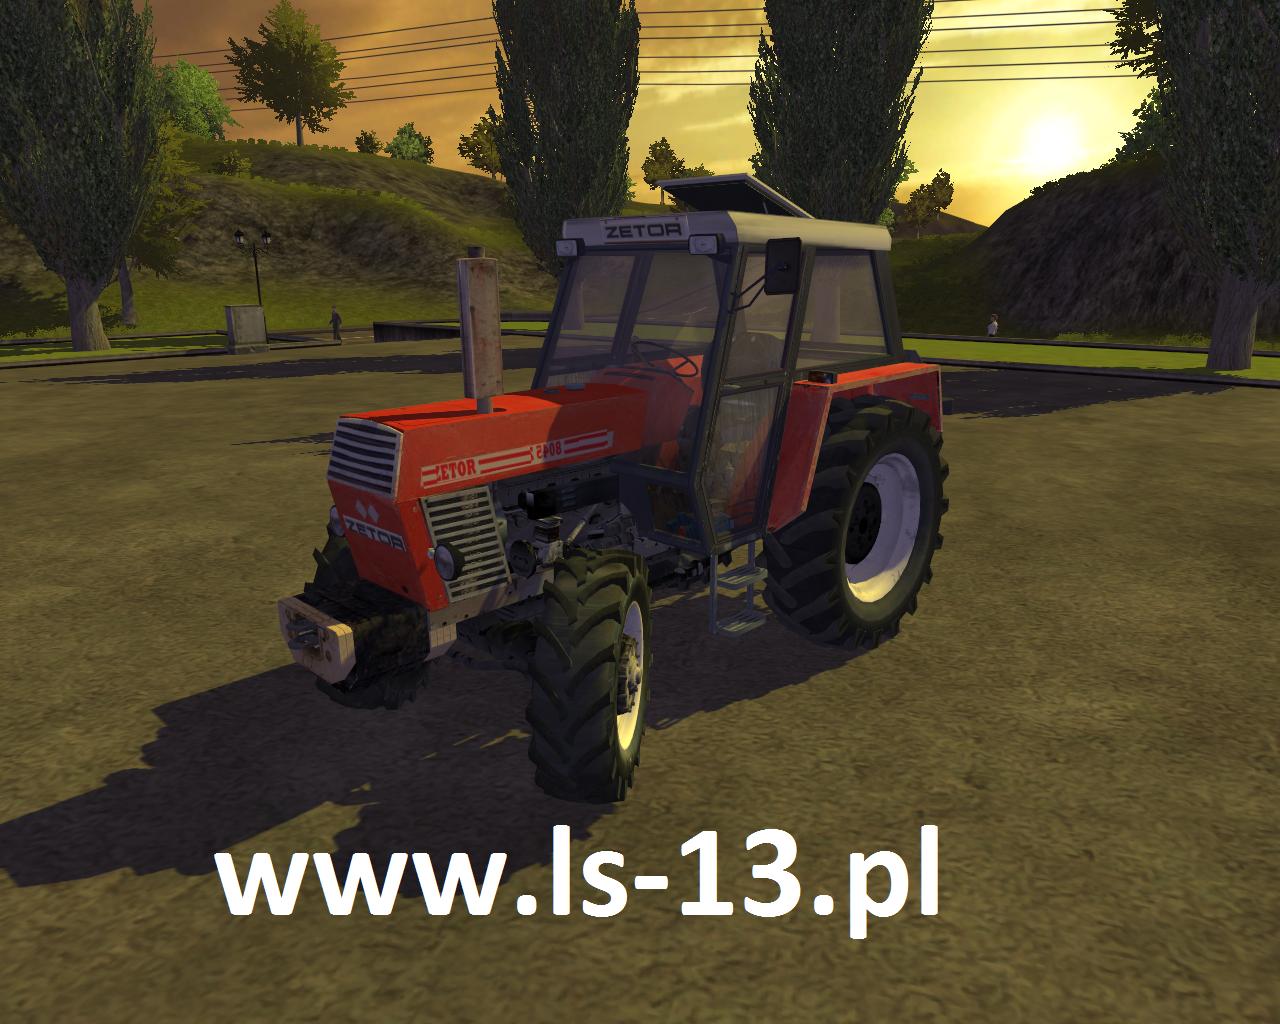 do Symulator Farmy 2013 Mody chomikuj - tomasz1212.94 - Chomikuj.pl ...